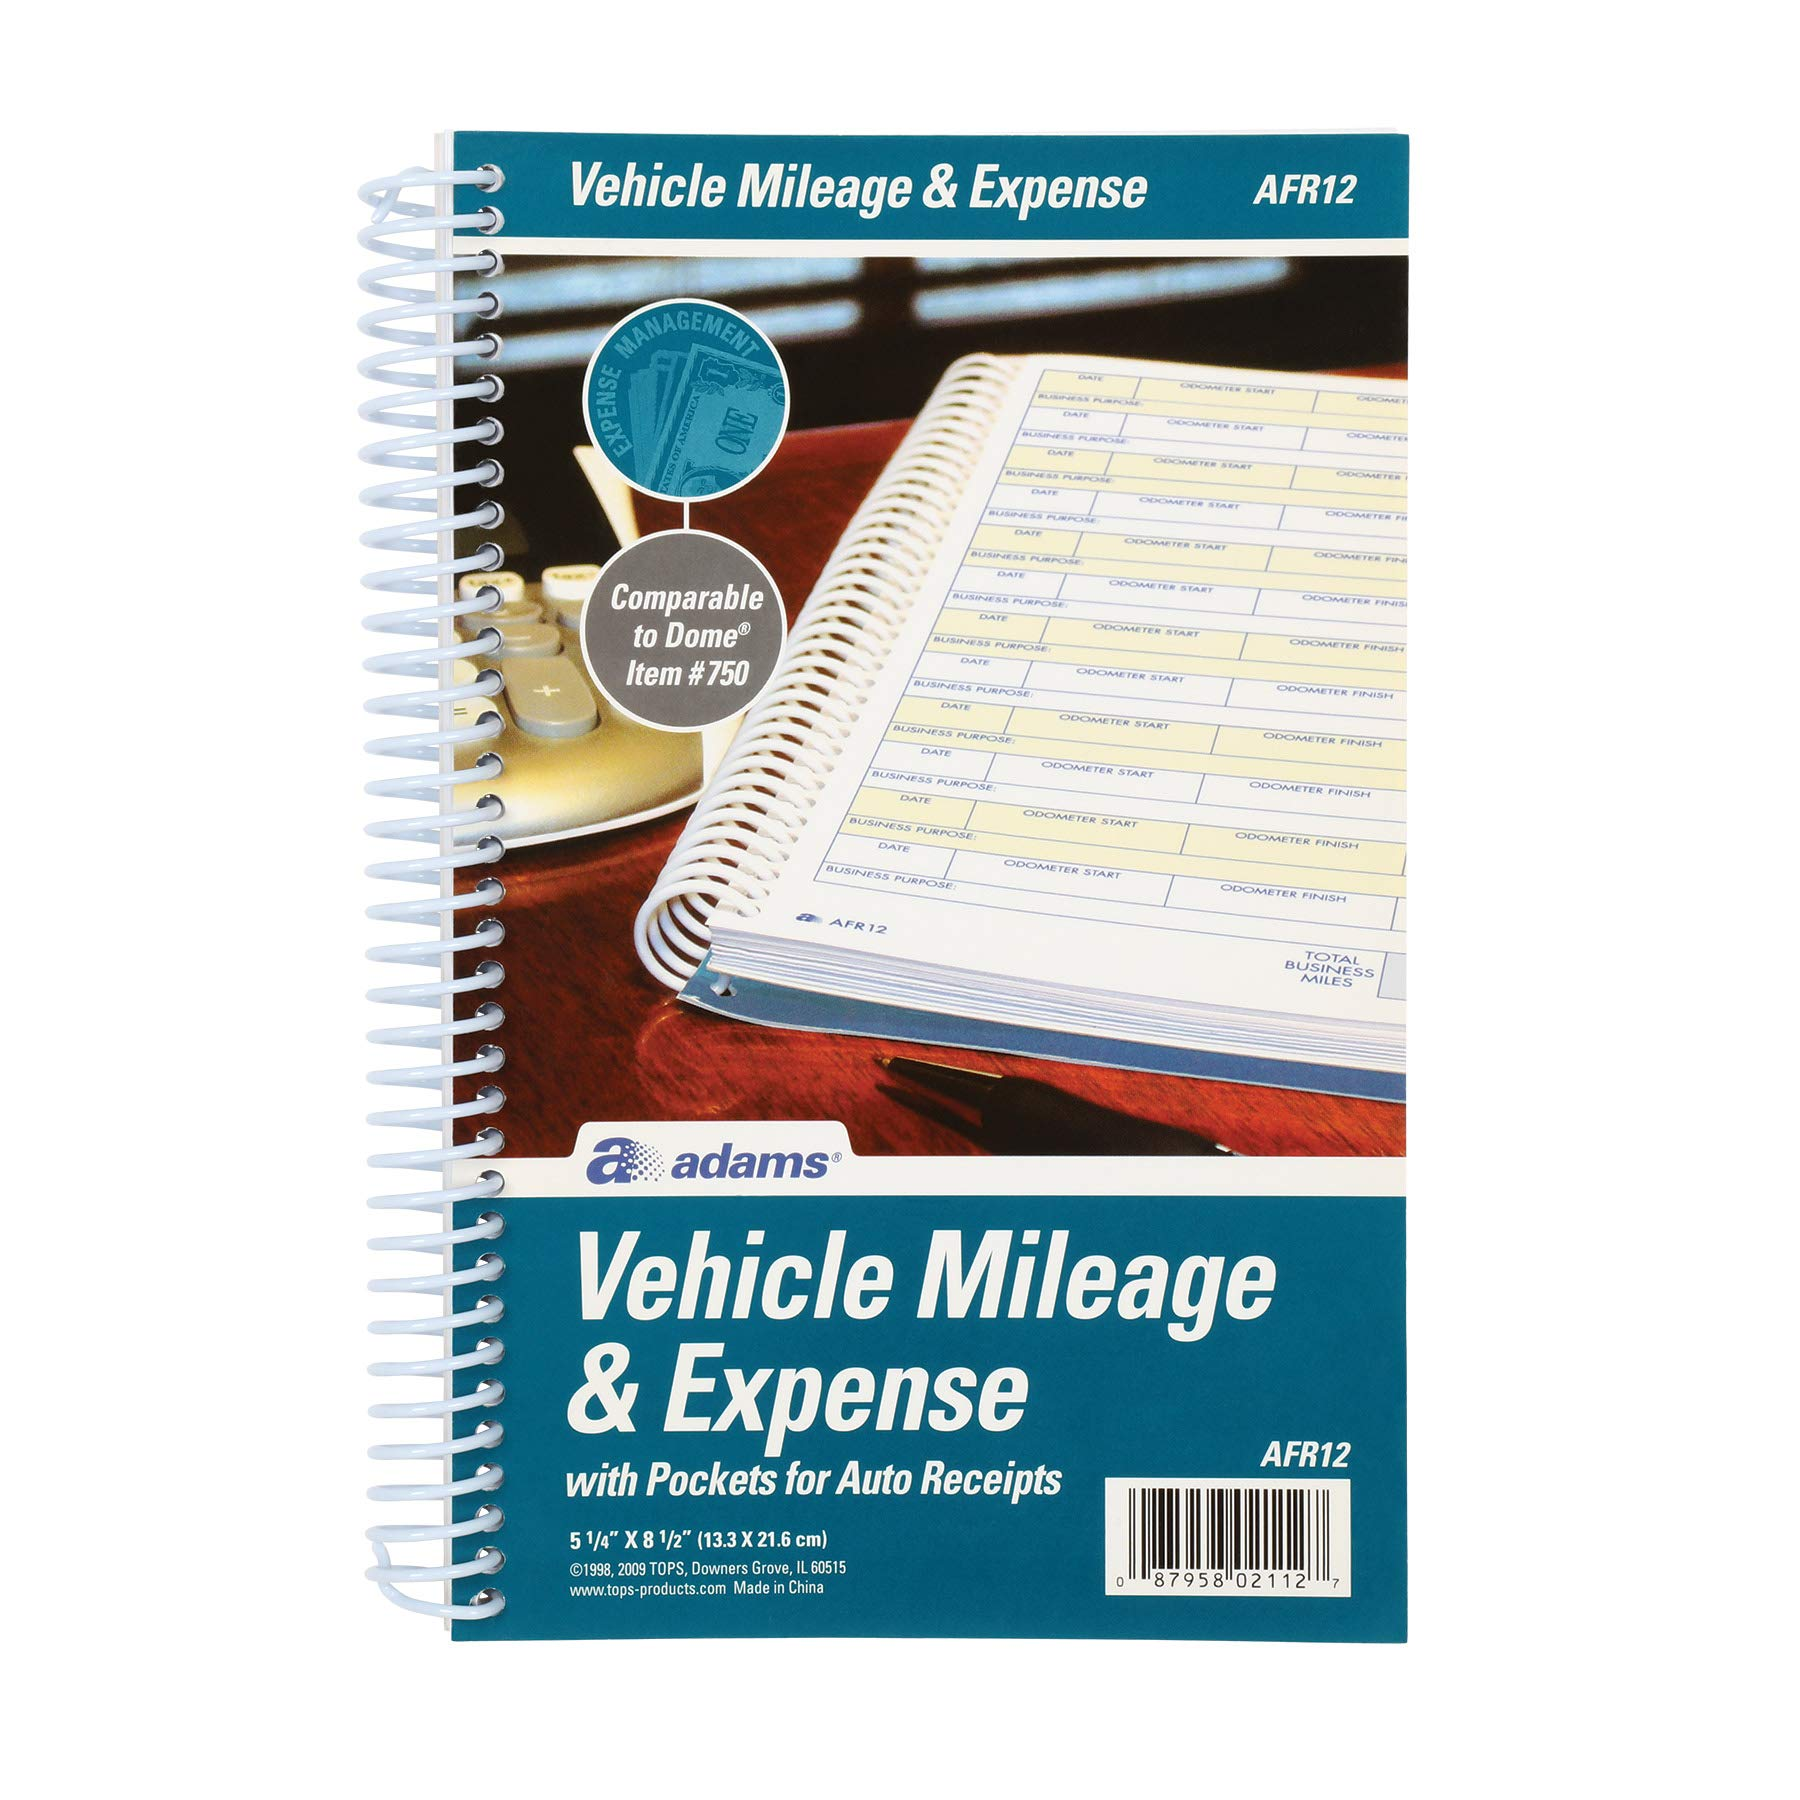 Adams Vehicle Mileage and Expense Journal, 5-1/4'' x 8-1/2'', Fits the Glove Box, Spiral Bound, 588 Mileage Entries, 6 Receipt Pockets, (AFR12)